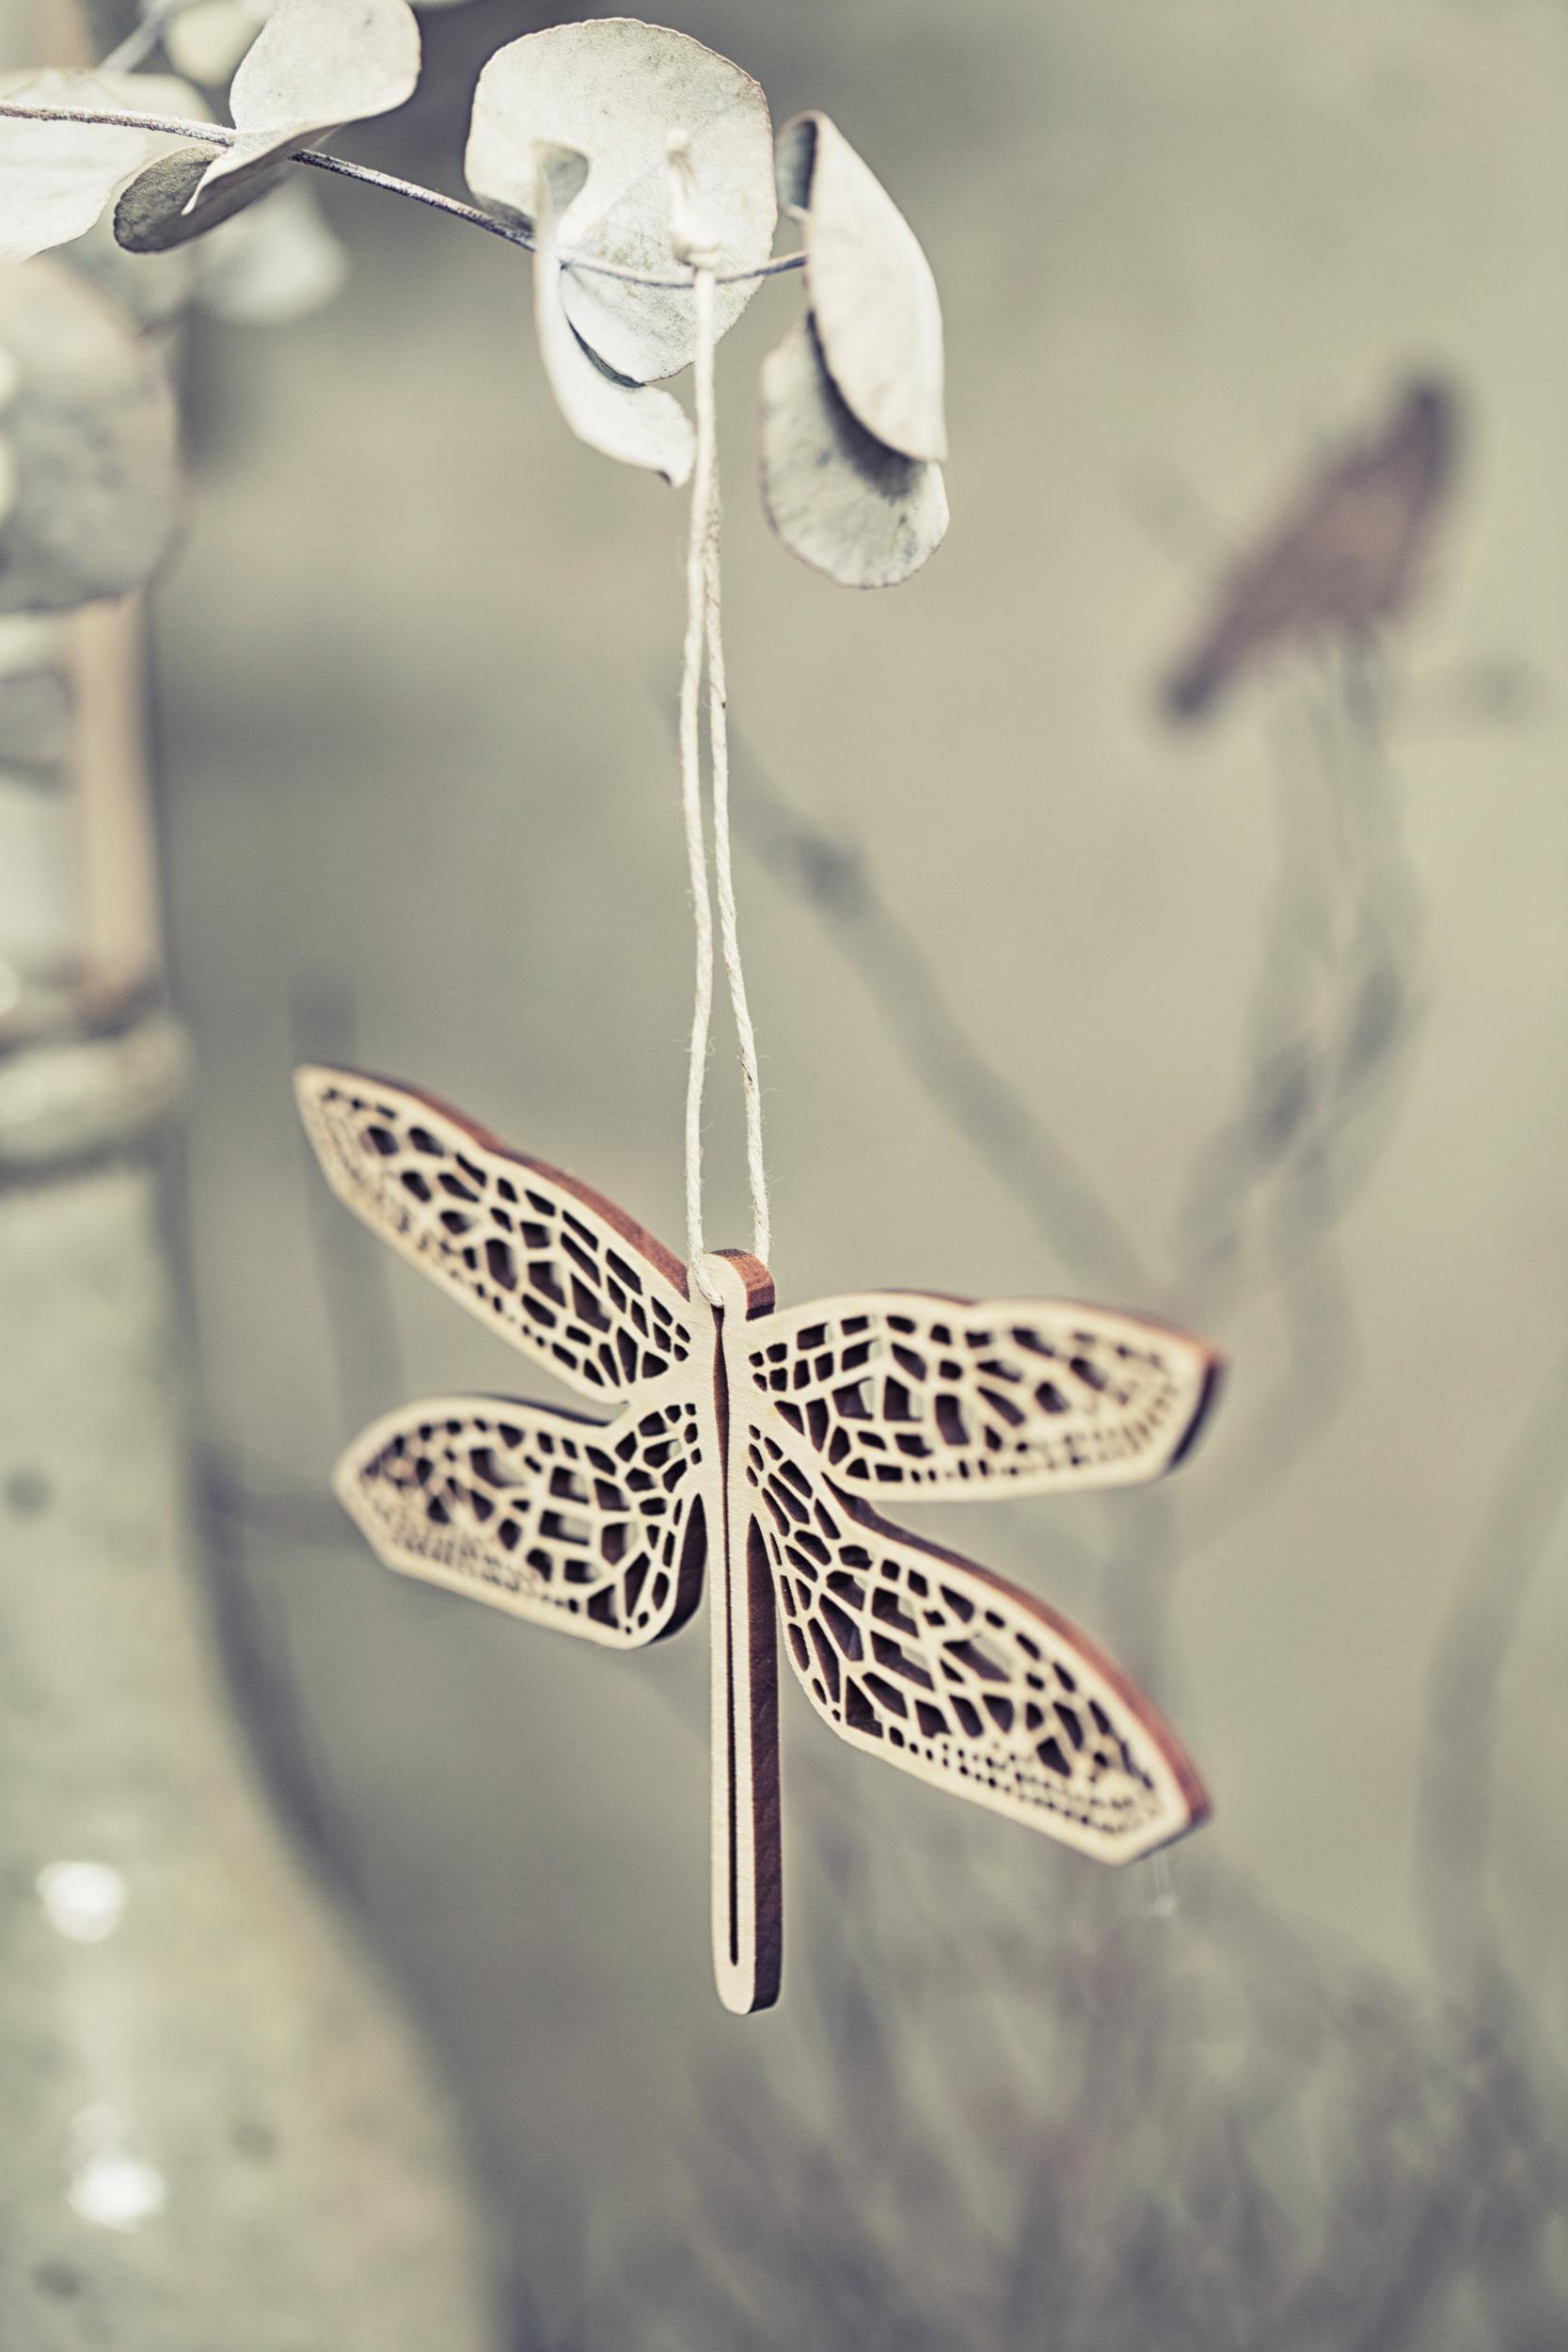 Dragon-fly design